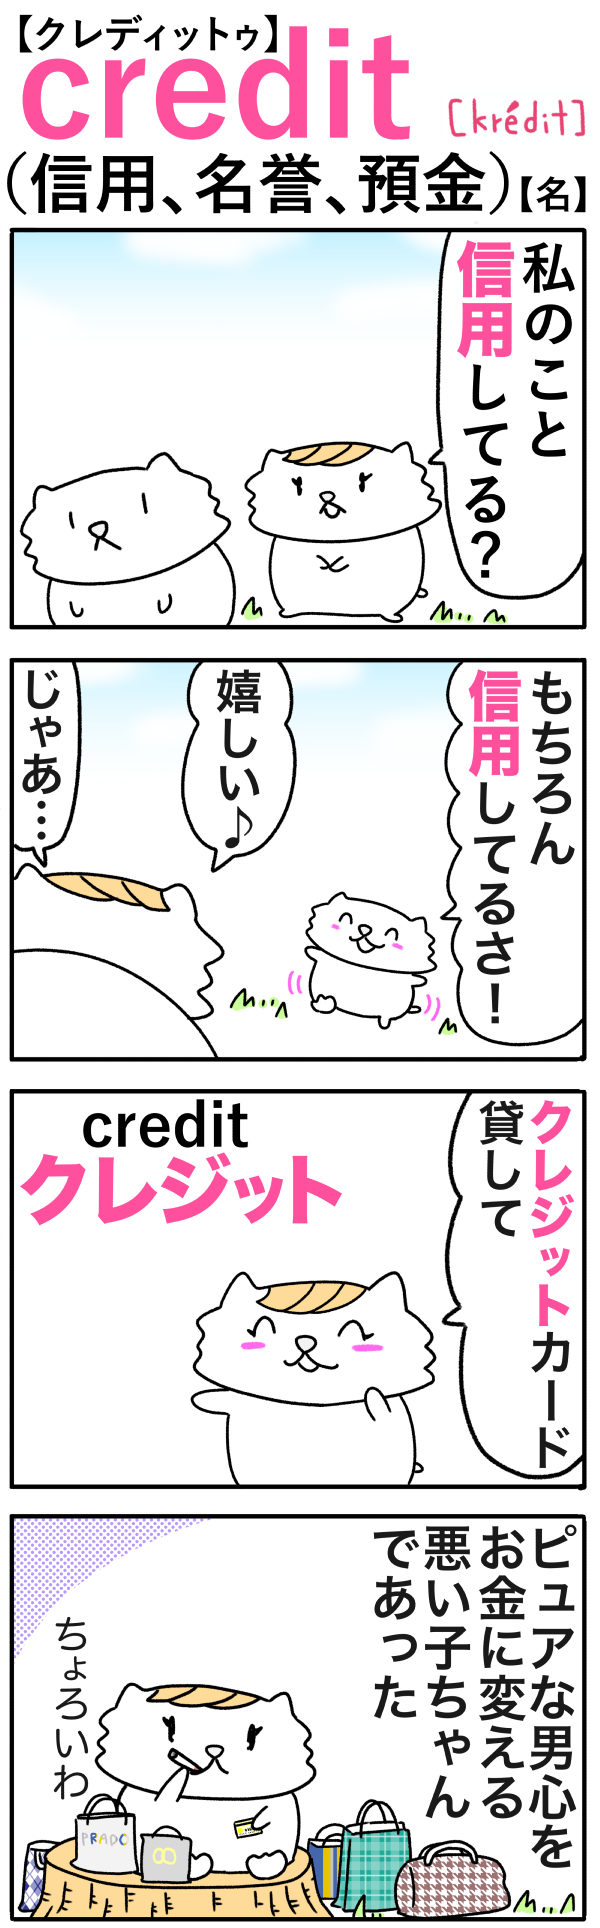 credit(信頼、名誉、預金)の語呂合わせ英単語